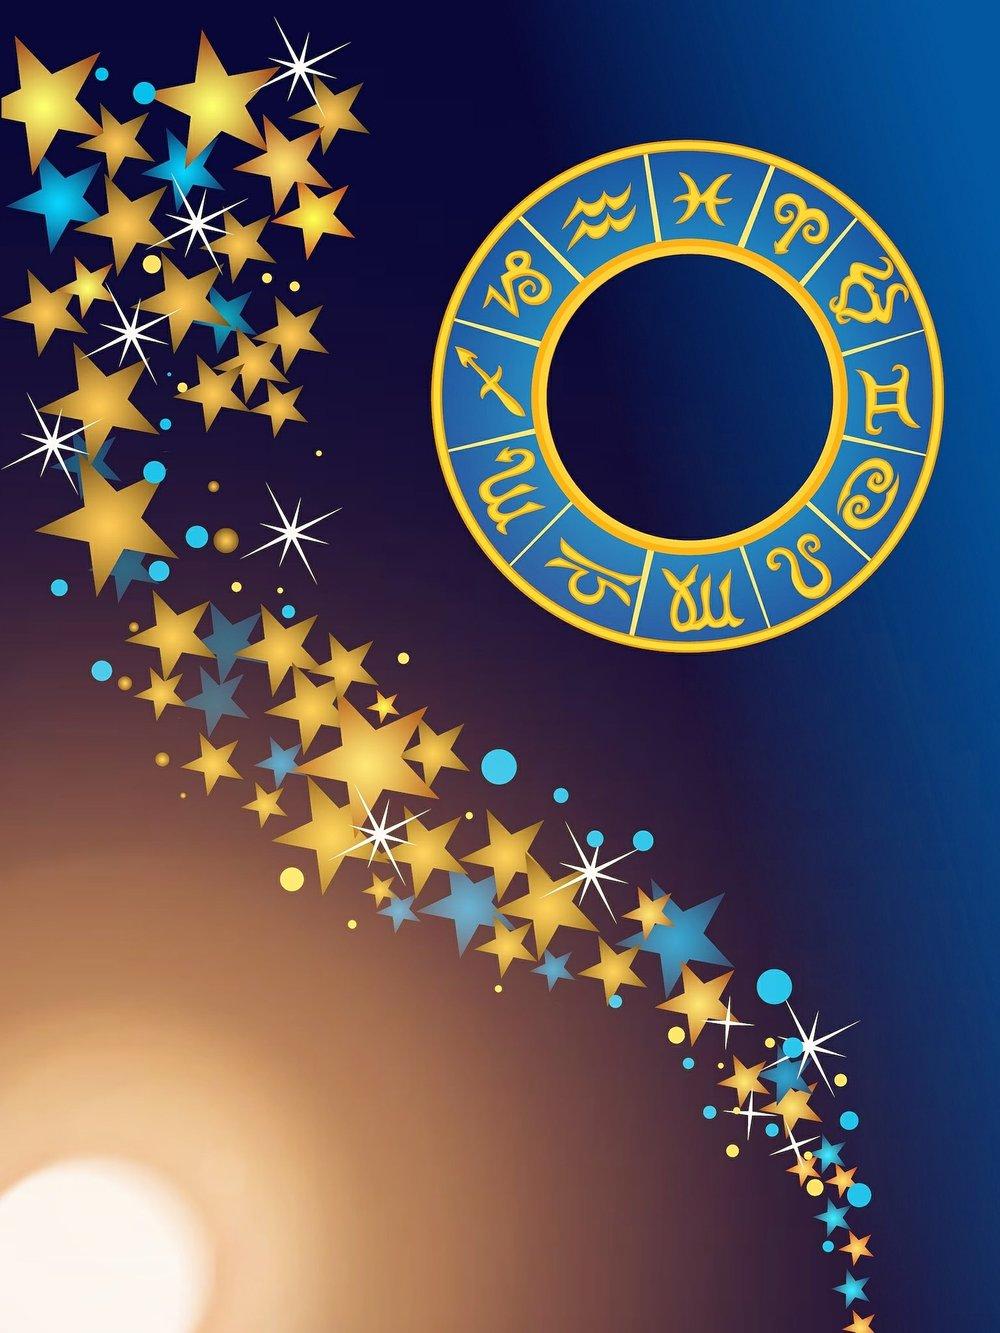 zodiac-sign-832478_1920.jpg